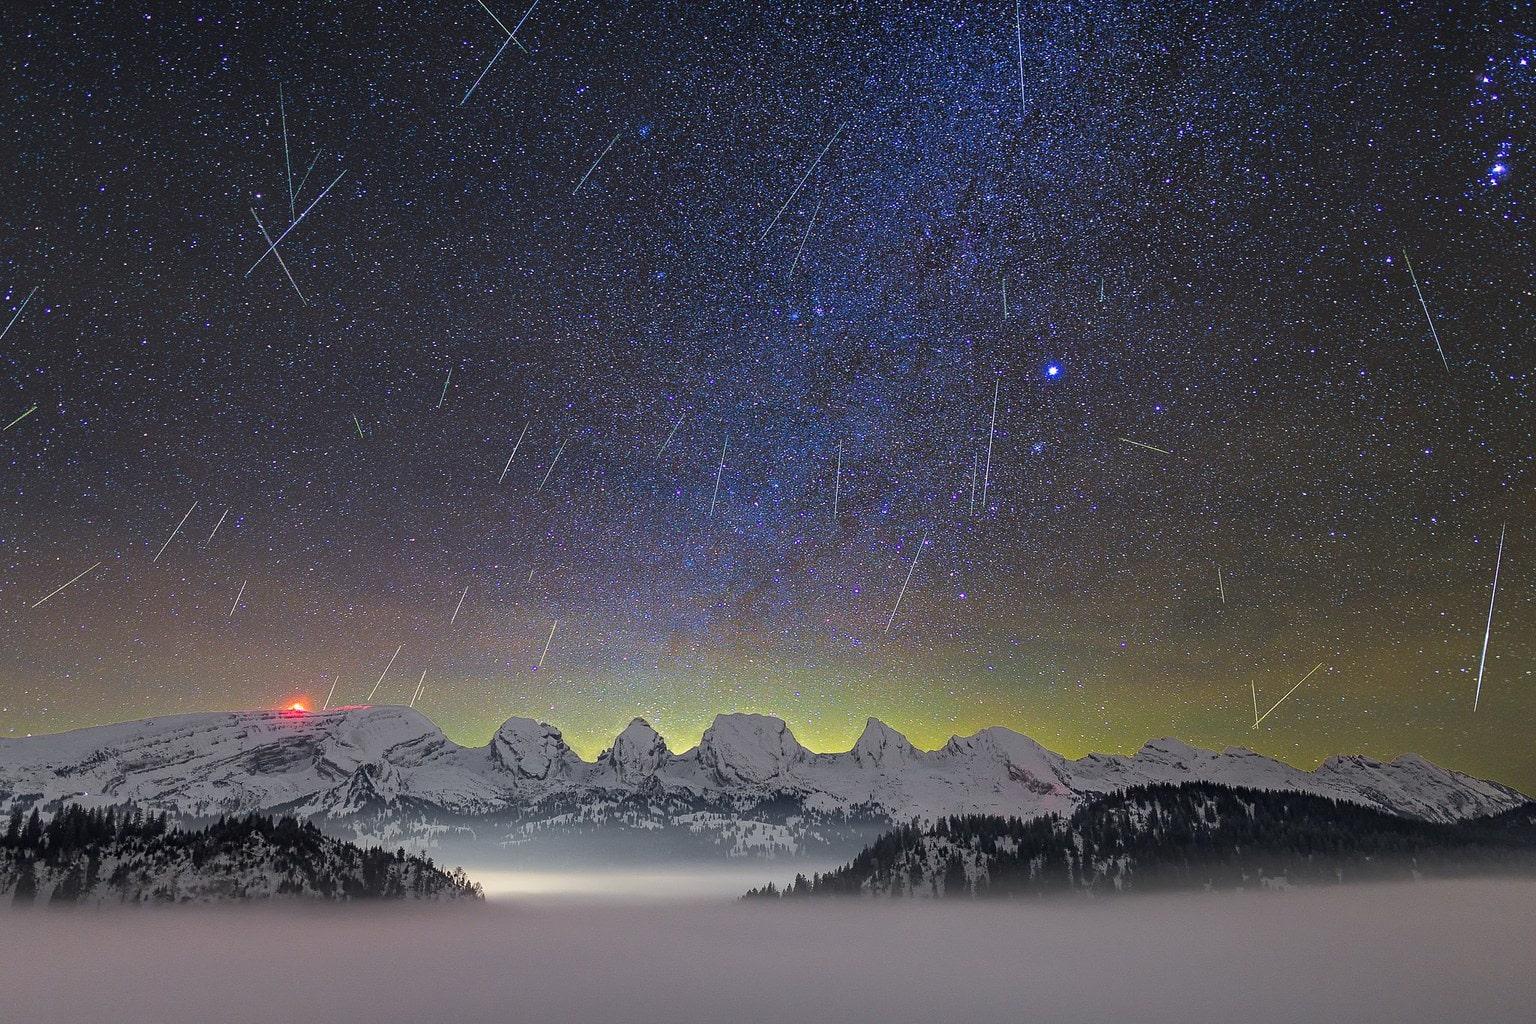 lluvia de estrellas